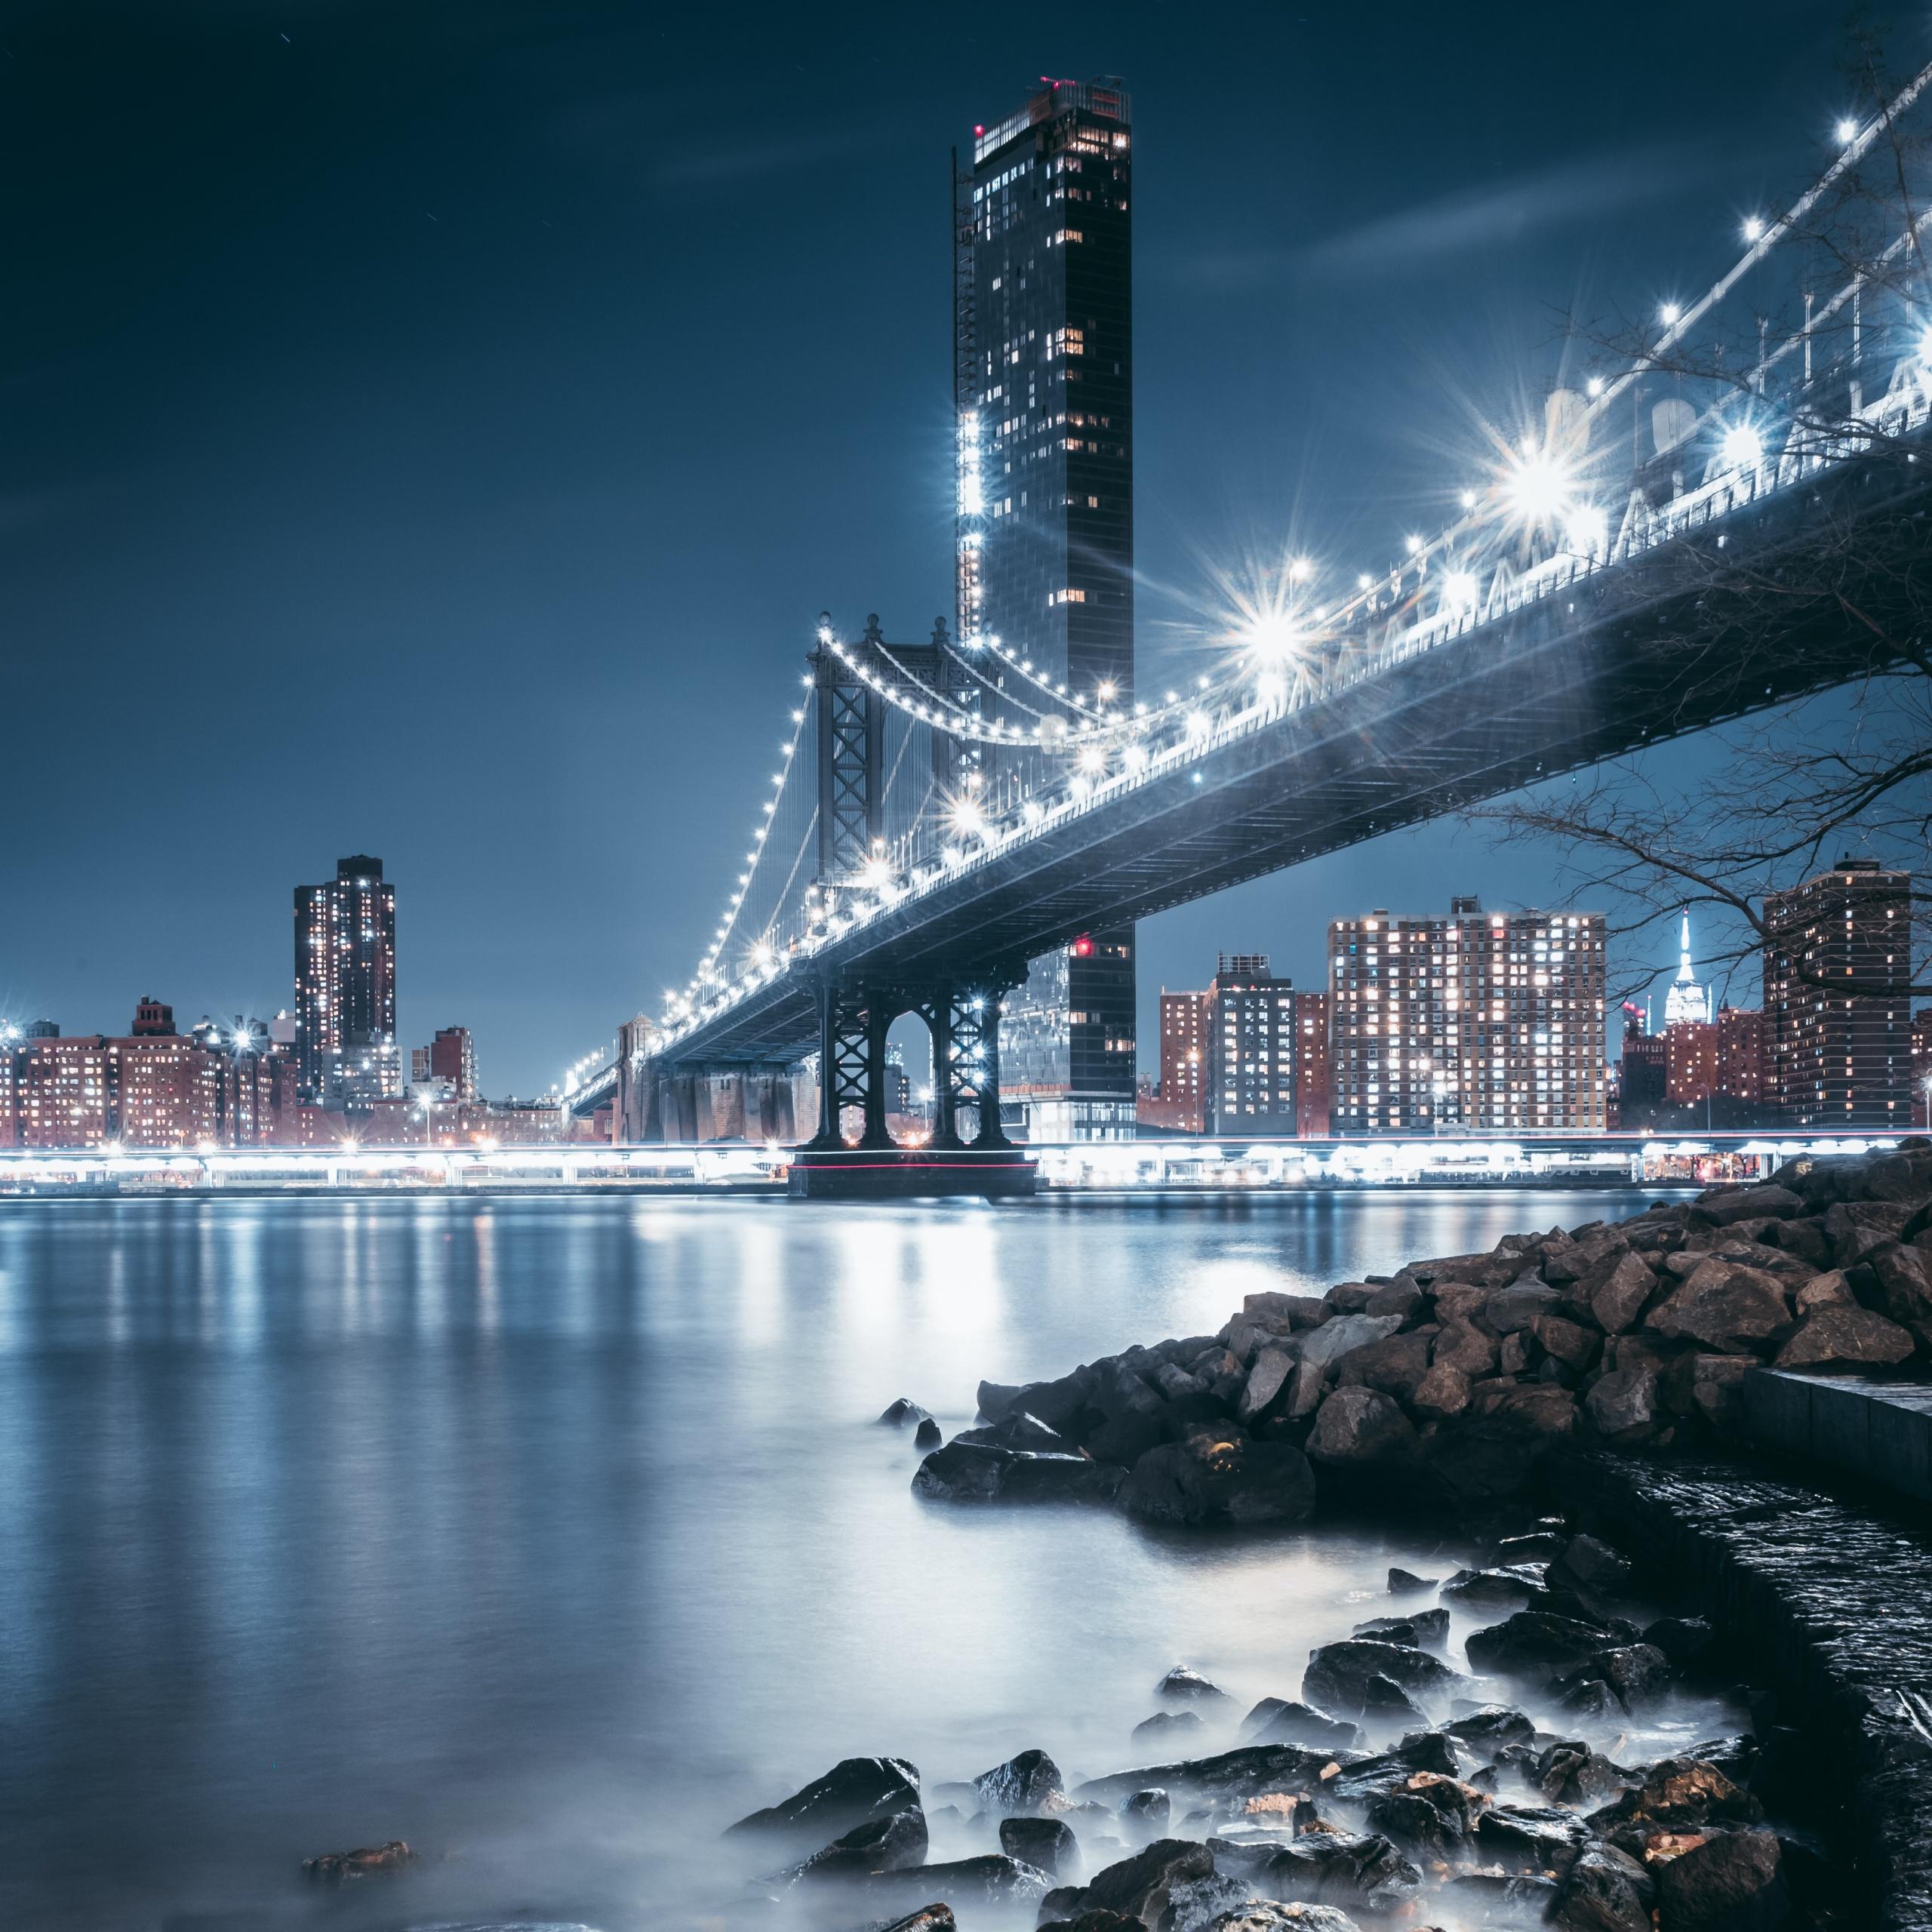 4K Wallpaper George Washington Bridge, Night, City Lights